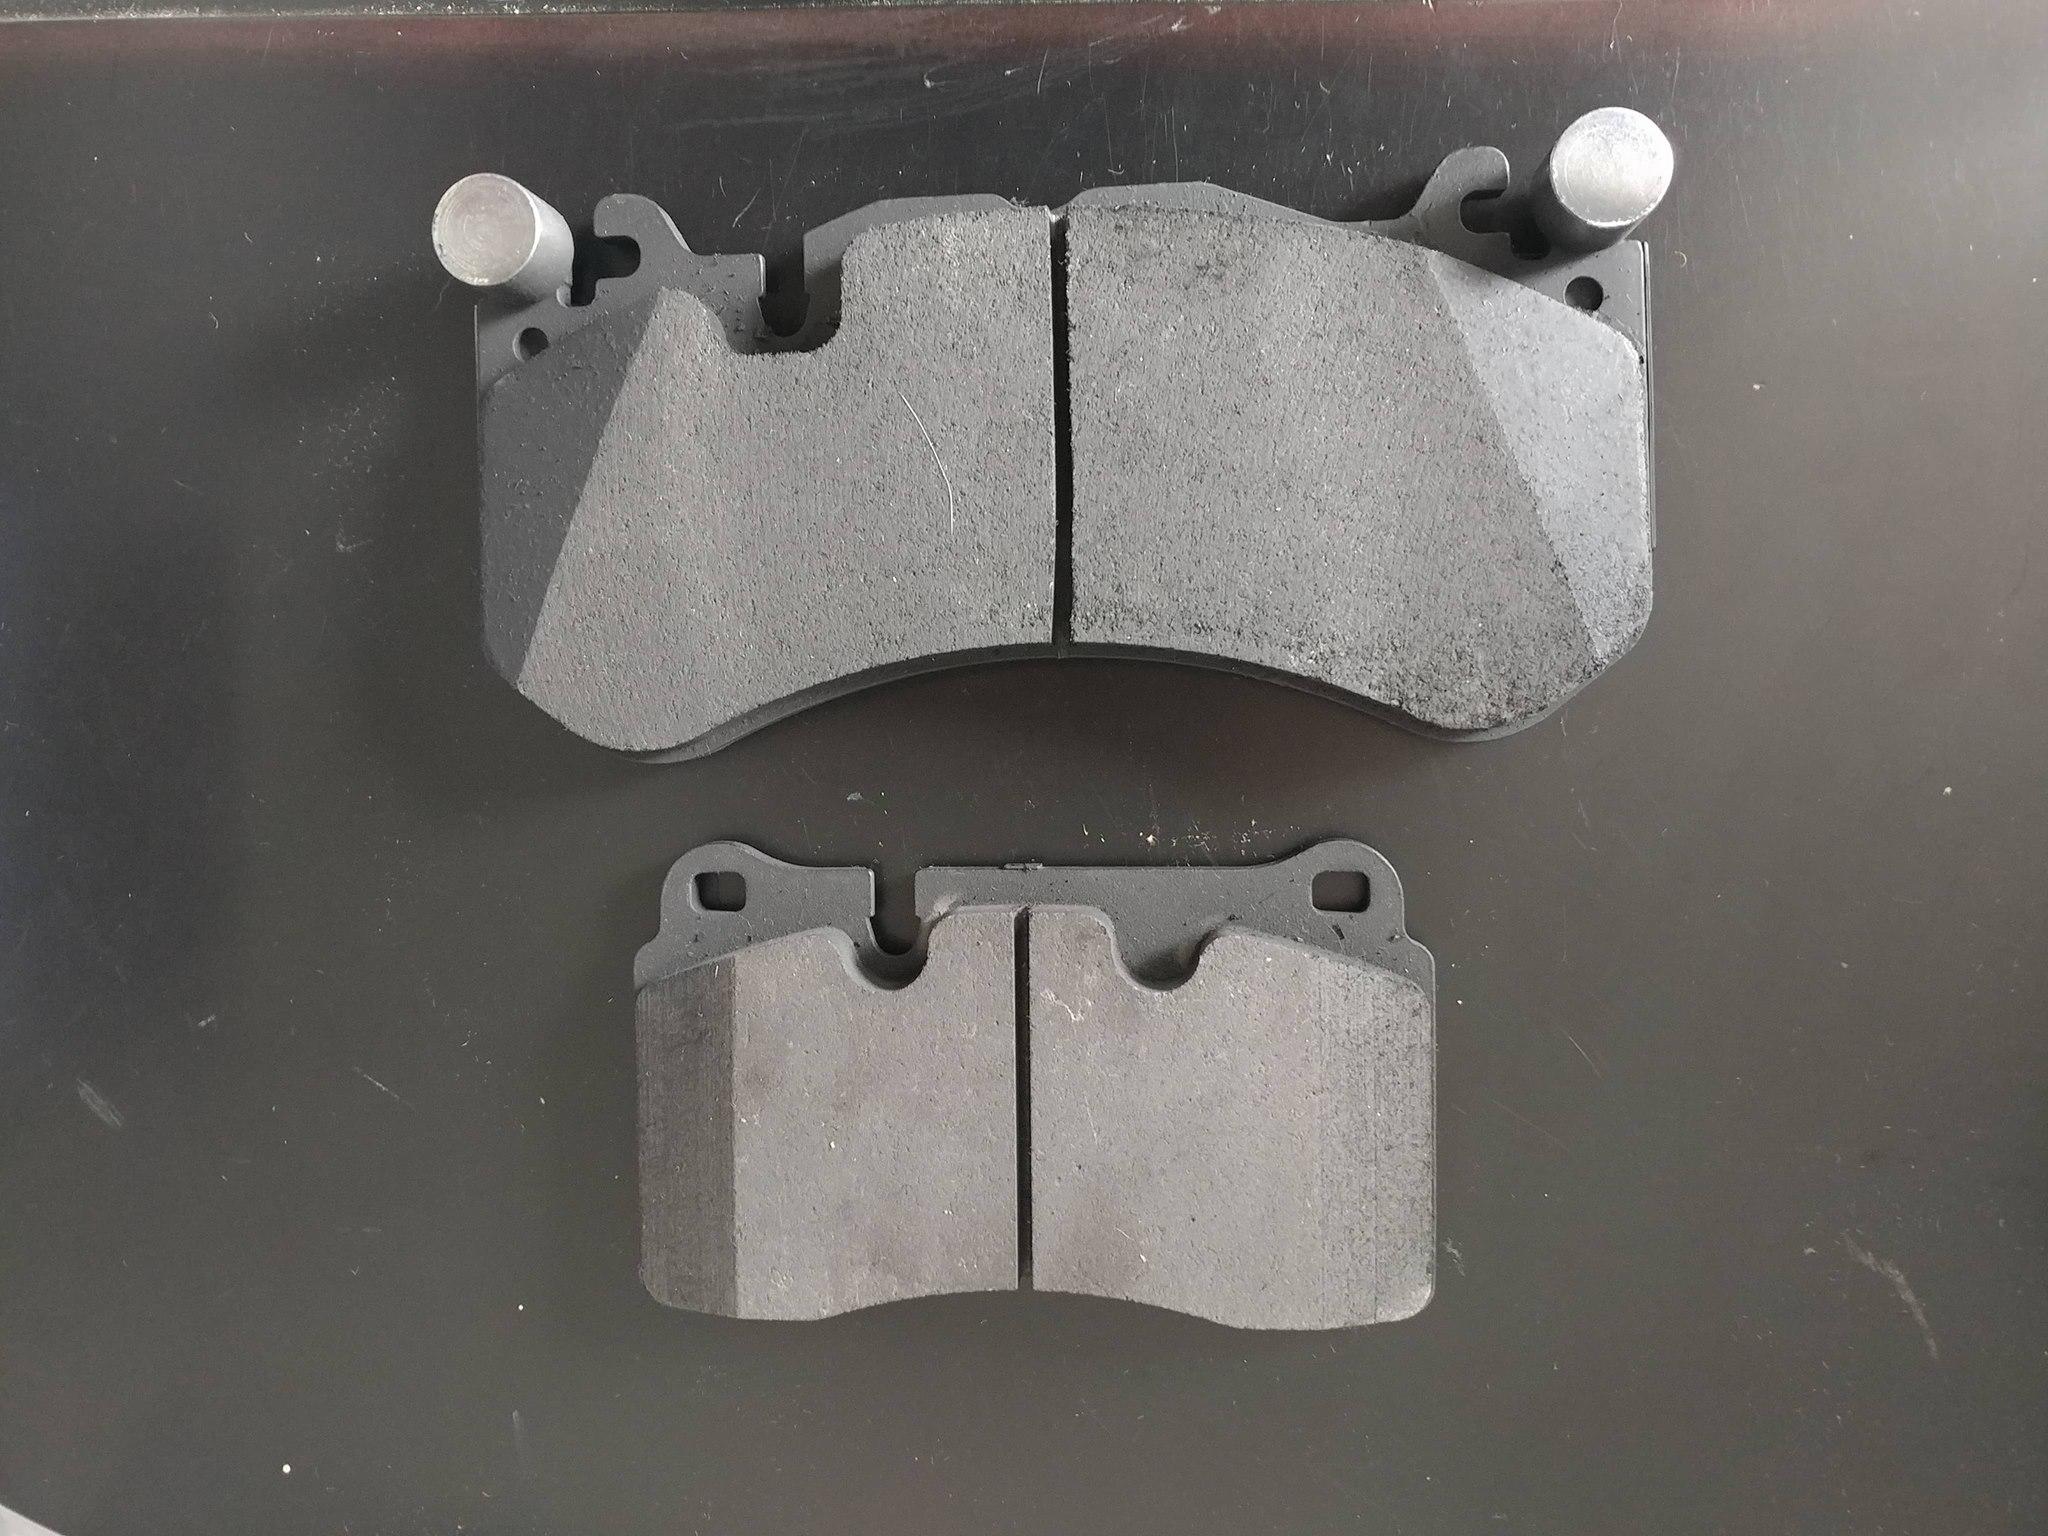 6-piston (top) vs 4-piston (bottom) R4-S brake pads. -Richard Seidlitz